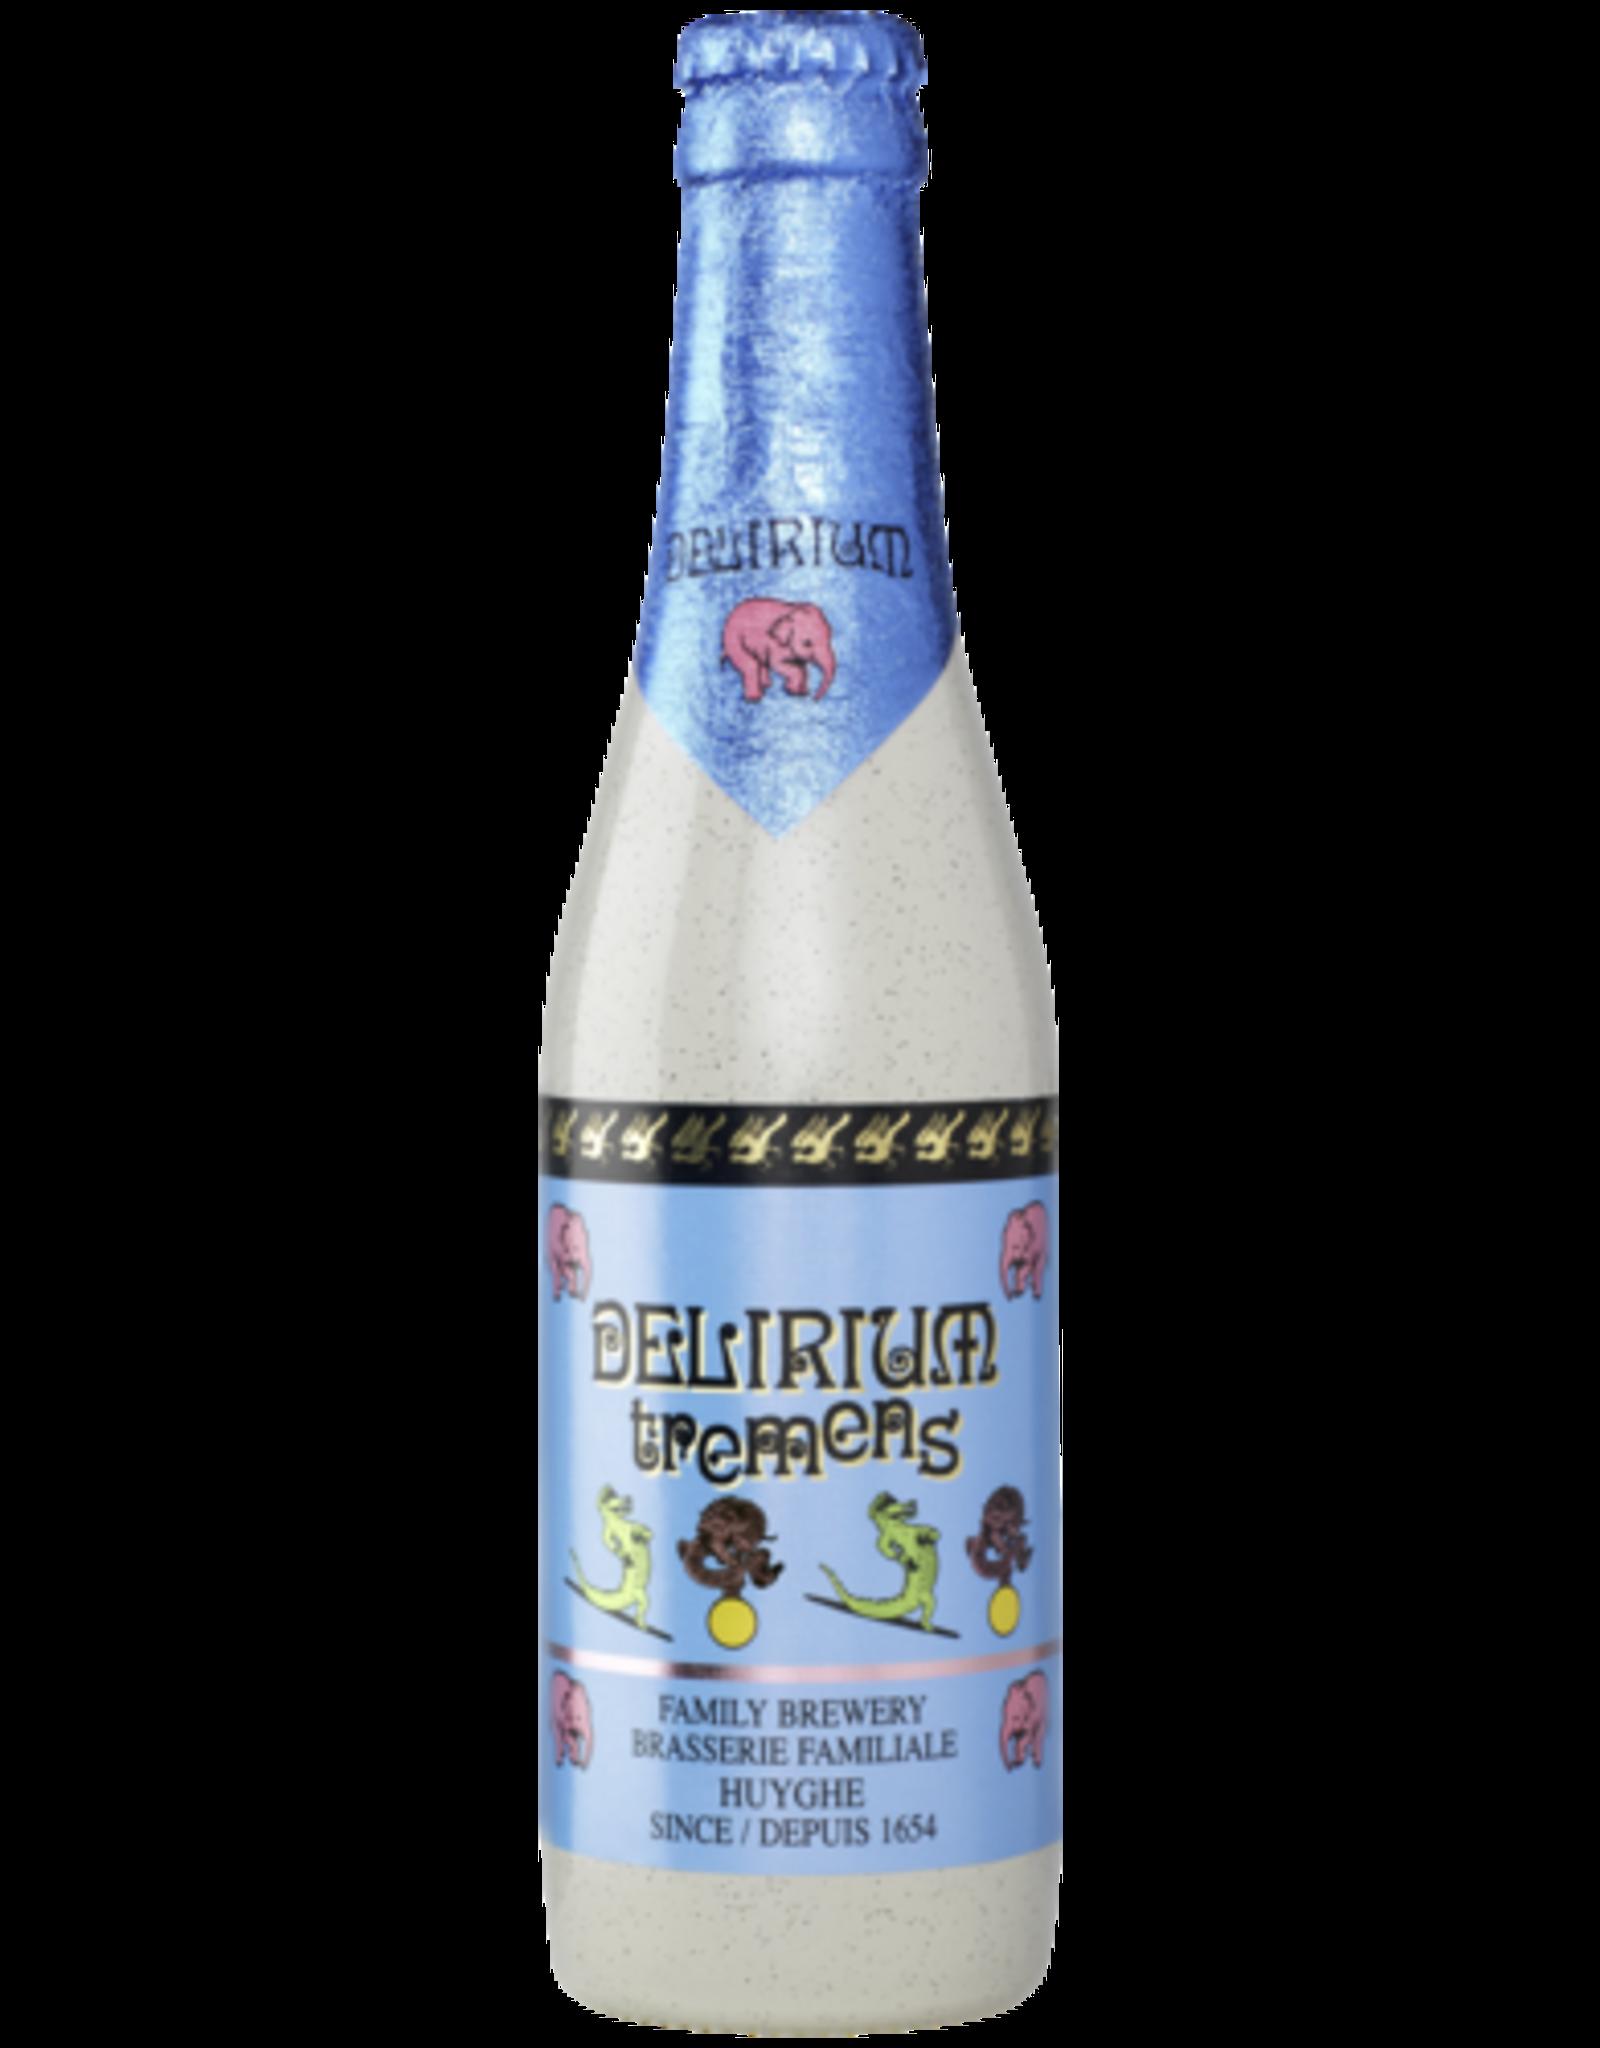 Delerium Delirium Tremens Strong Blond beer 33cl